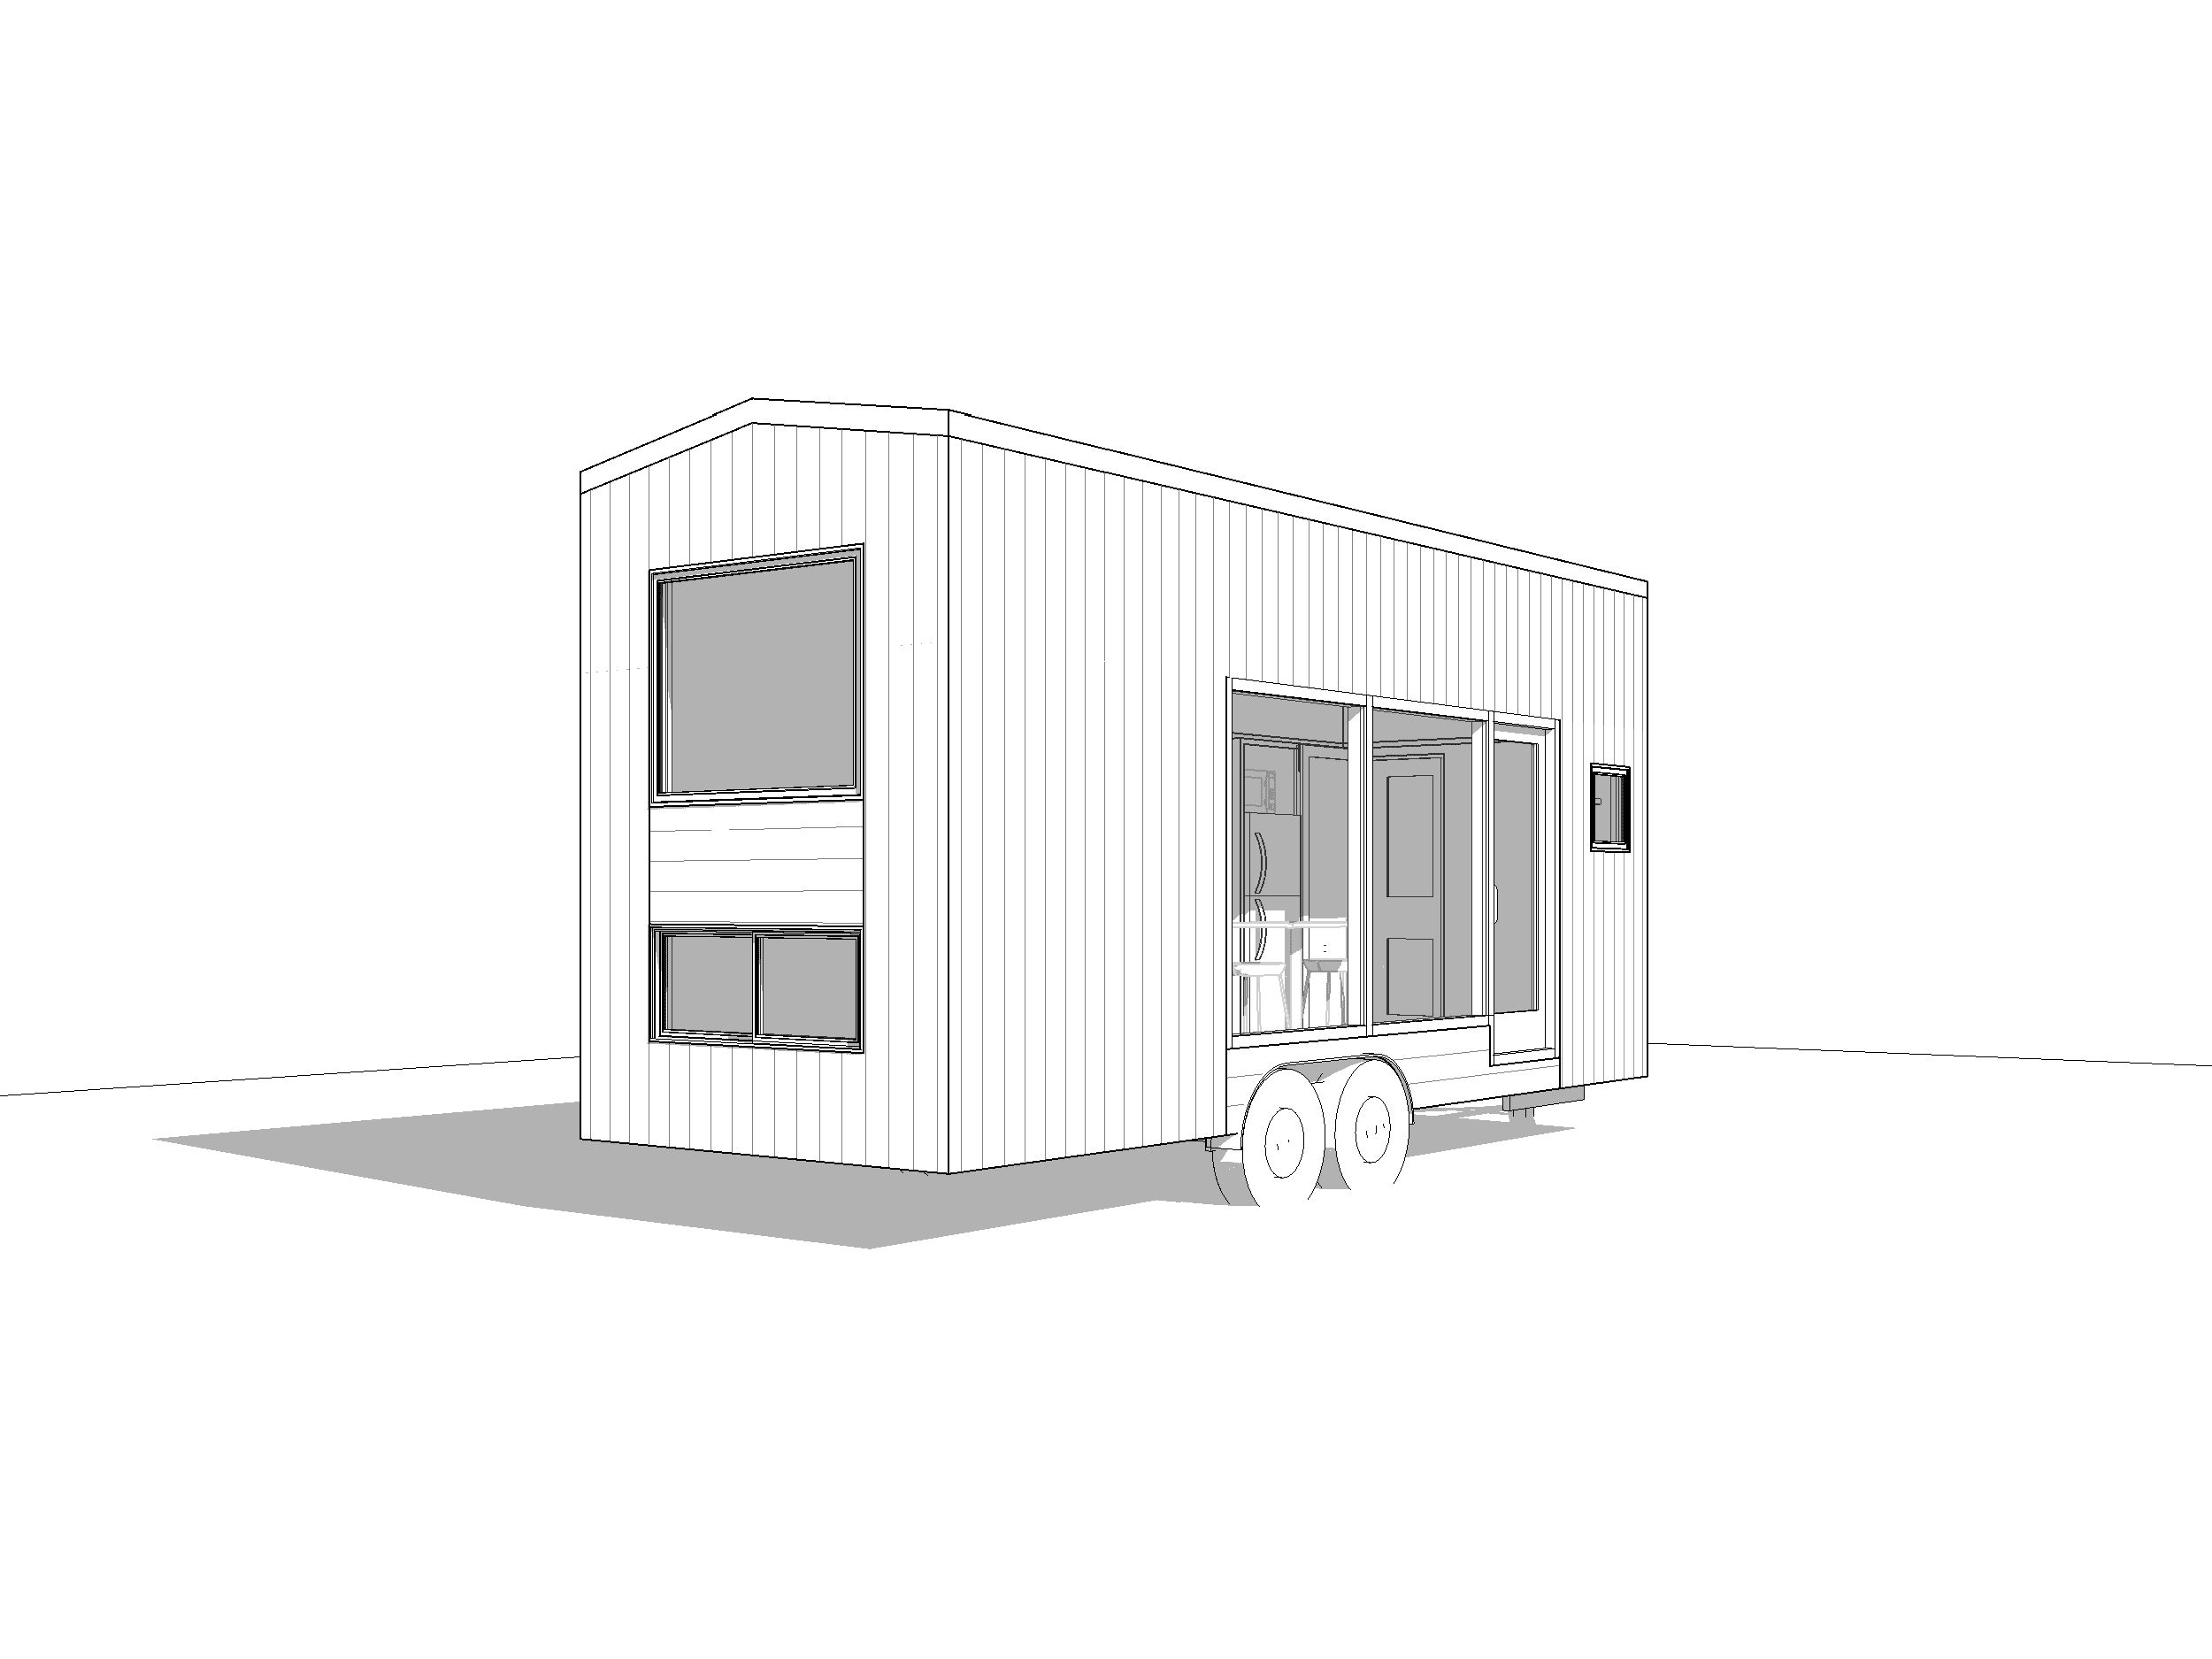 24ft-Rev-Obed-Mod-line-drawing-01